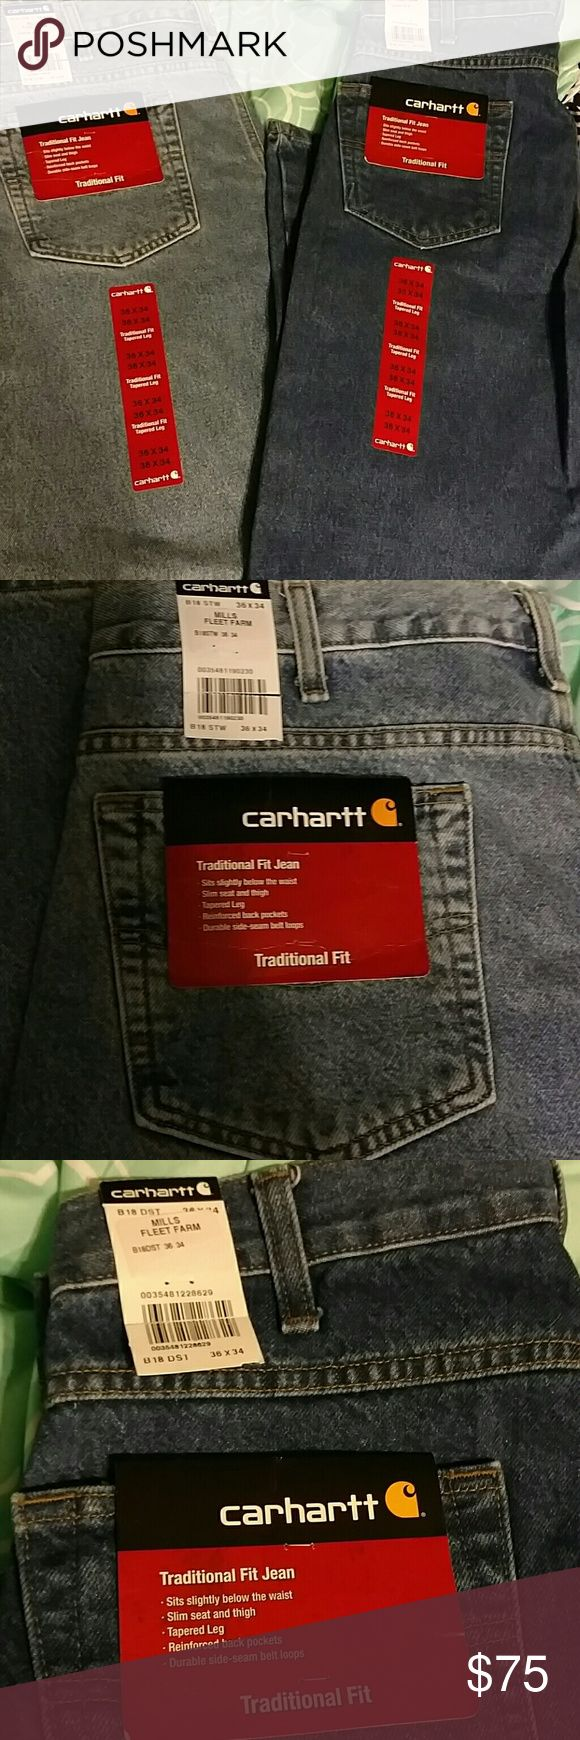 Mens Carhartt Jean's 2 pair men's Carhartt Jean's. Size 36x34. One light color, one dark color. Carhartt Jeans